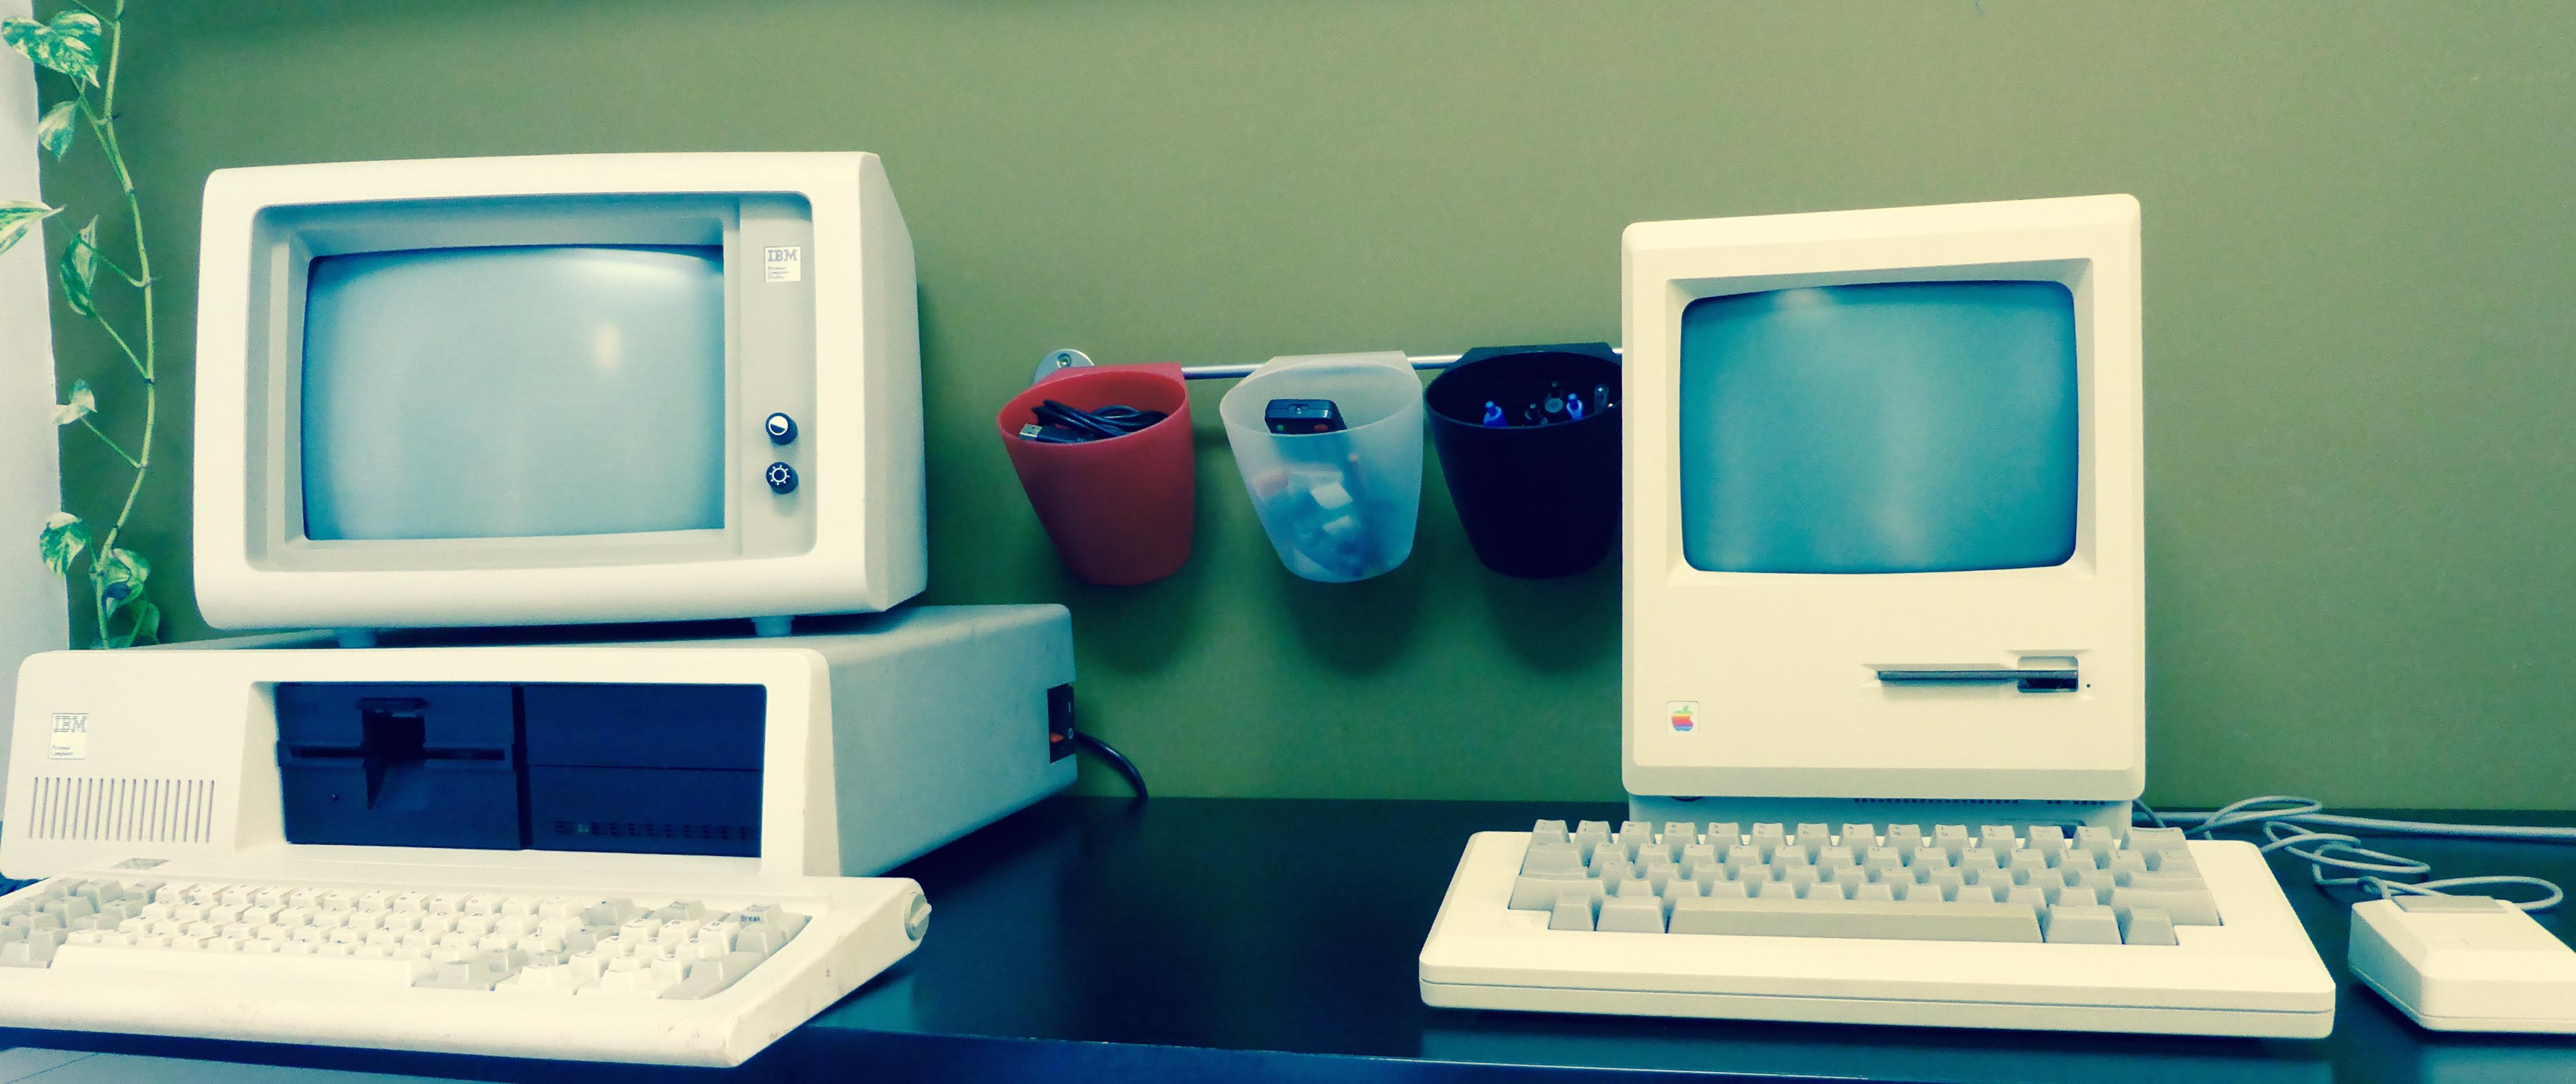 IBM 5150 vs Macintosh 128k